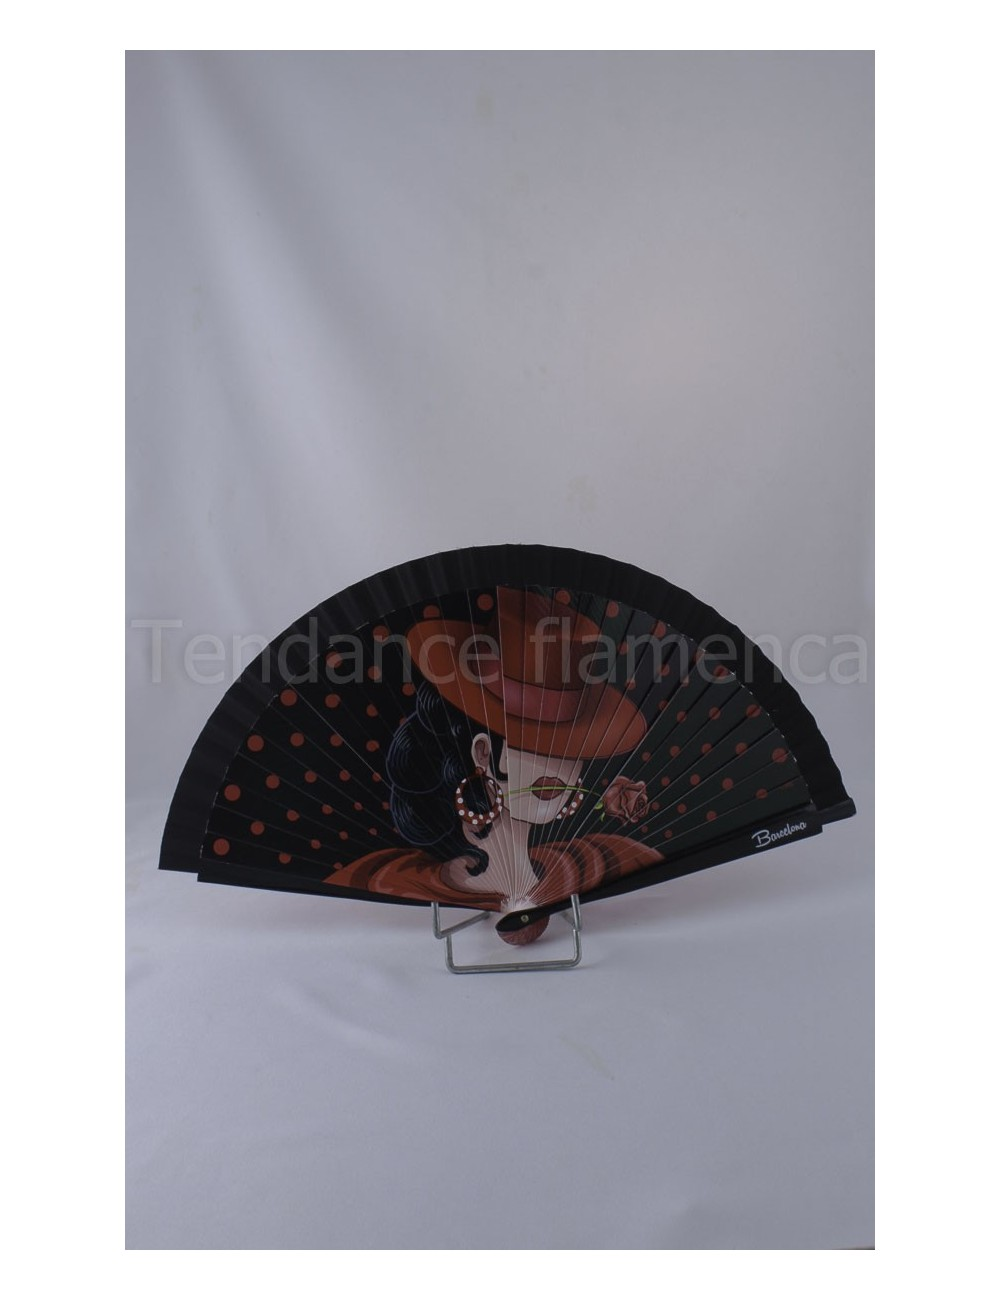 Eventail flamenco danseuse